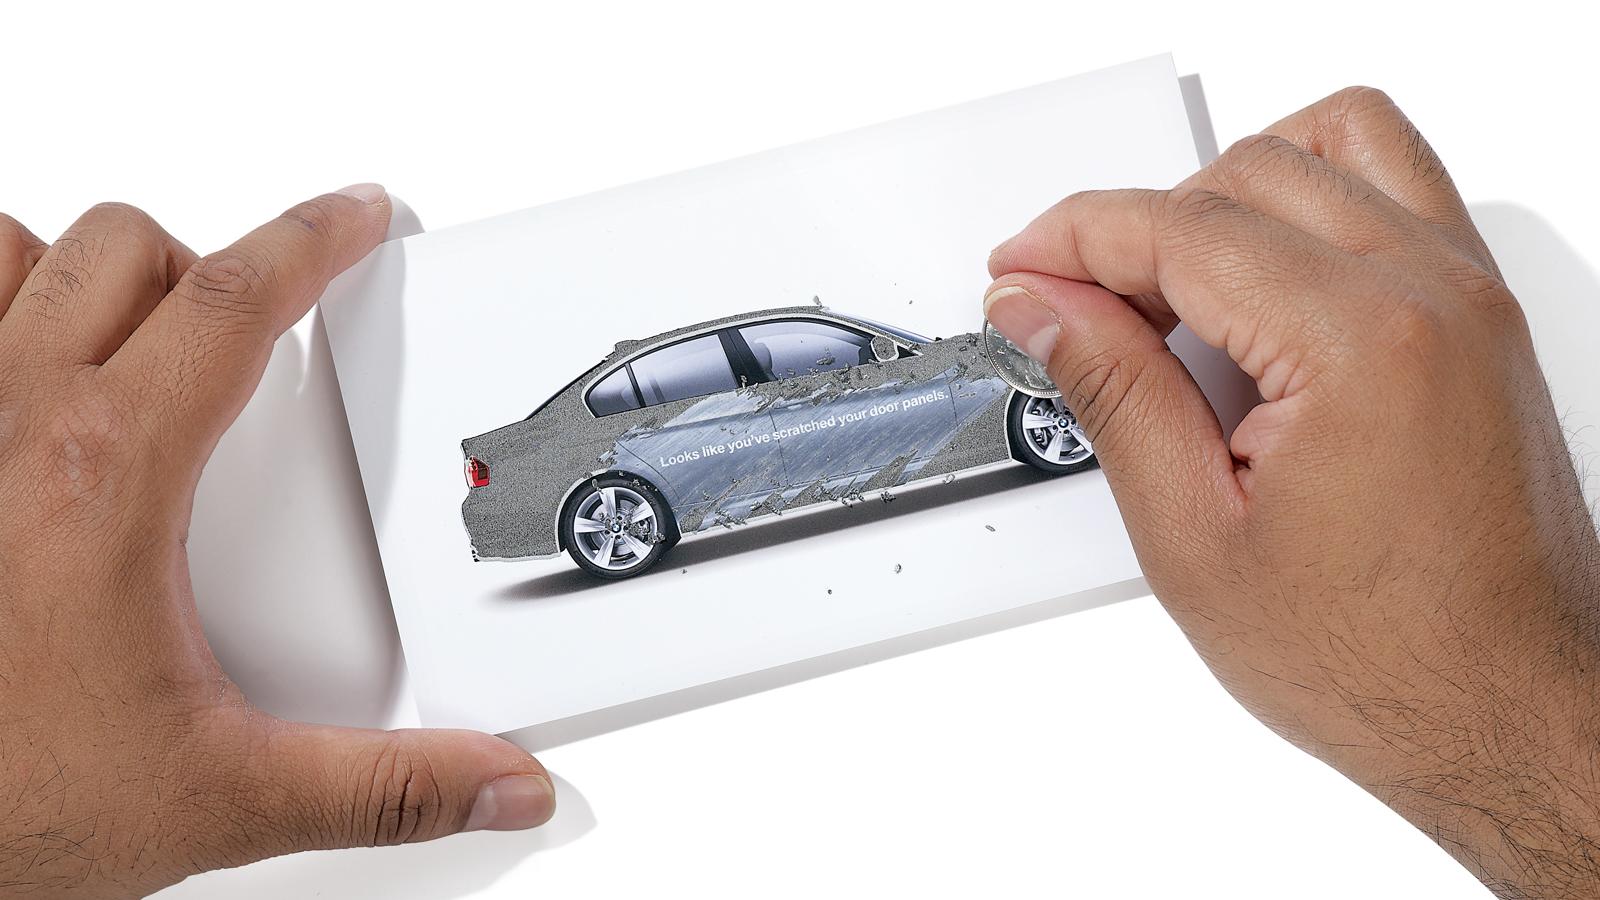 BMW Canada | Envoi postal BMW à gratter | Automobile, Marketing direct